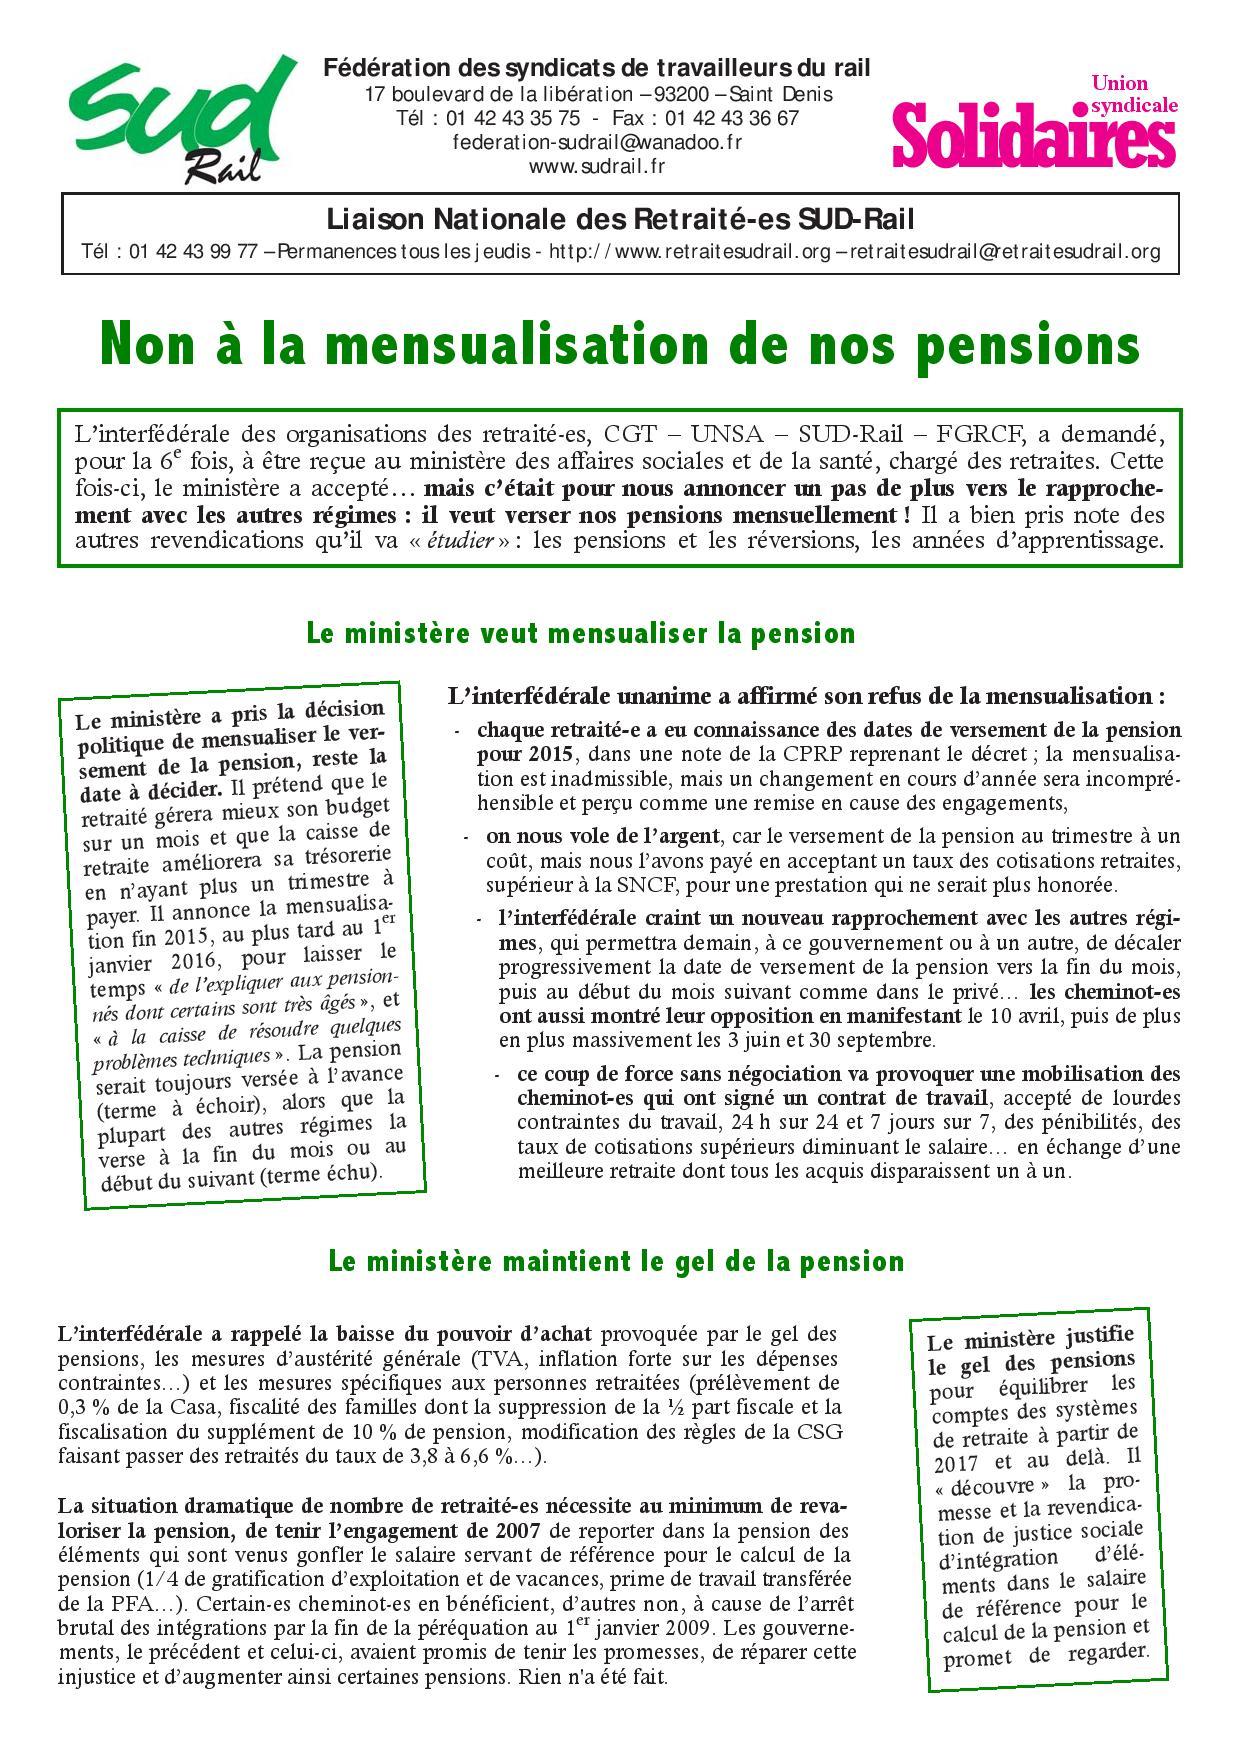 mensualisation retraites 01-2016-page-001